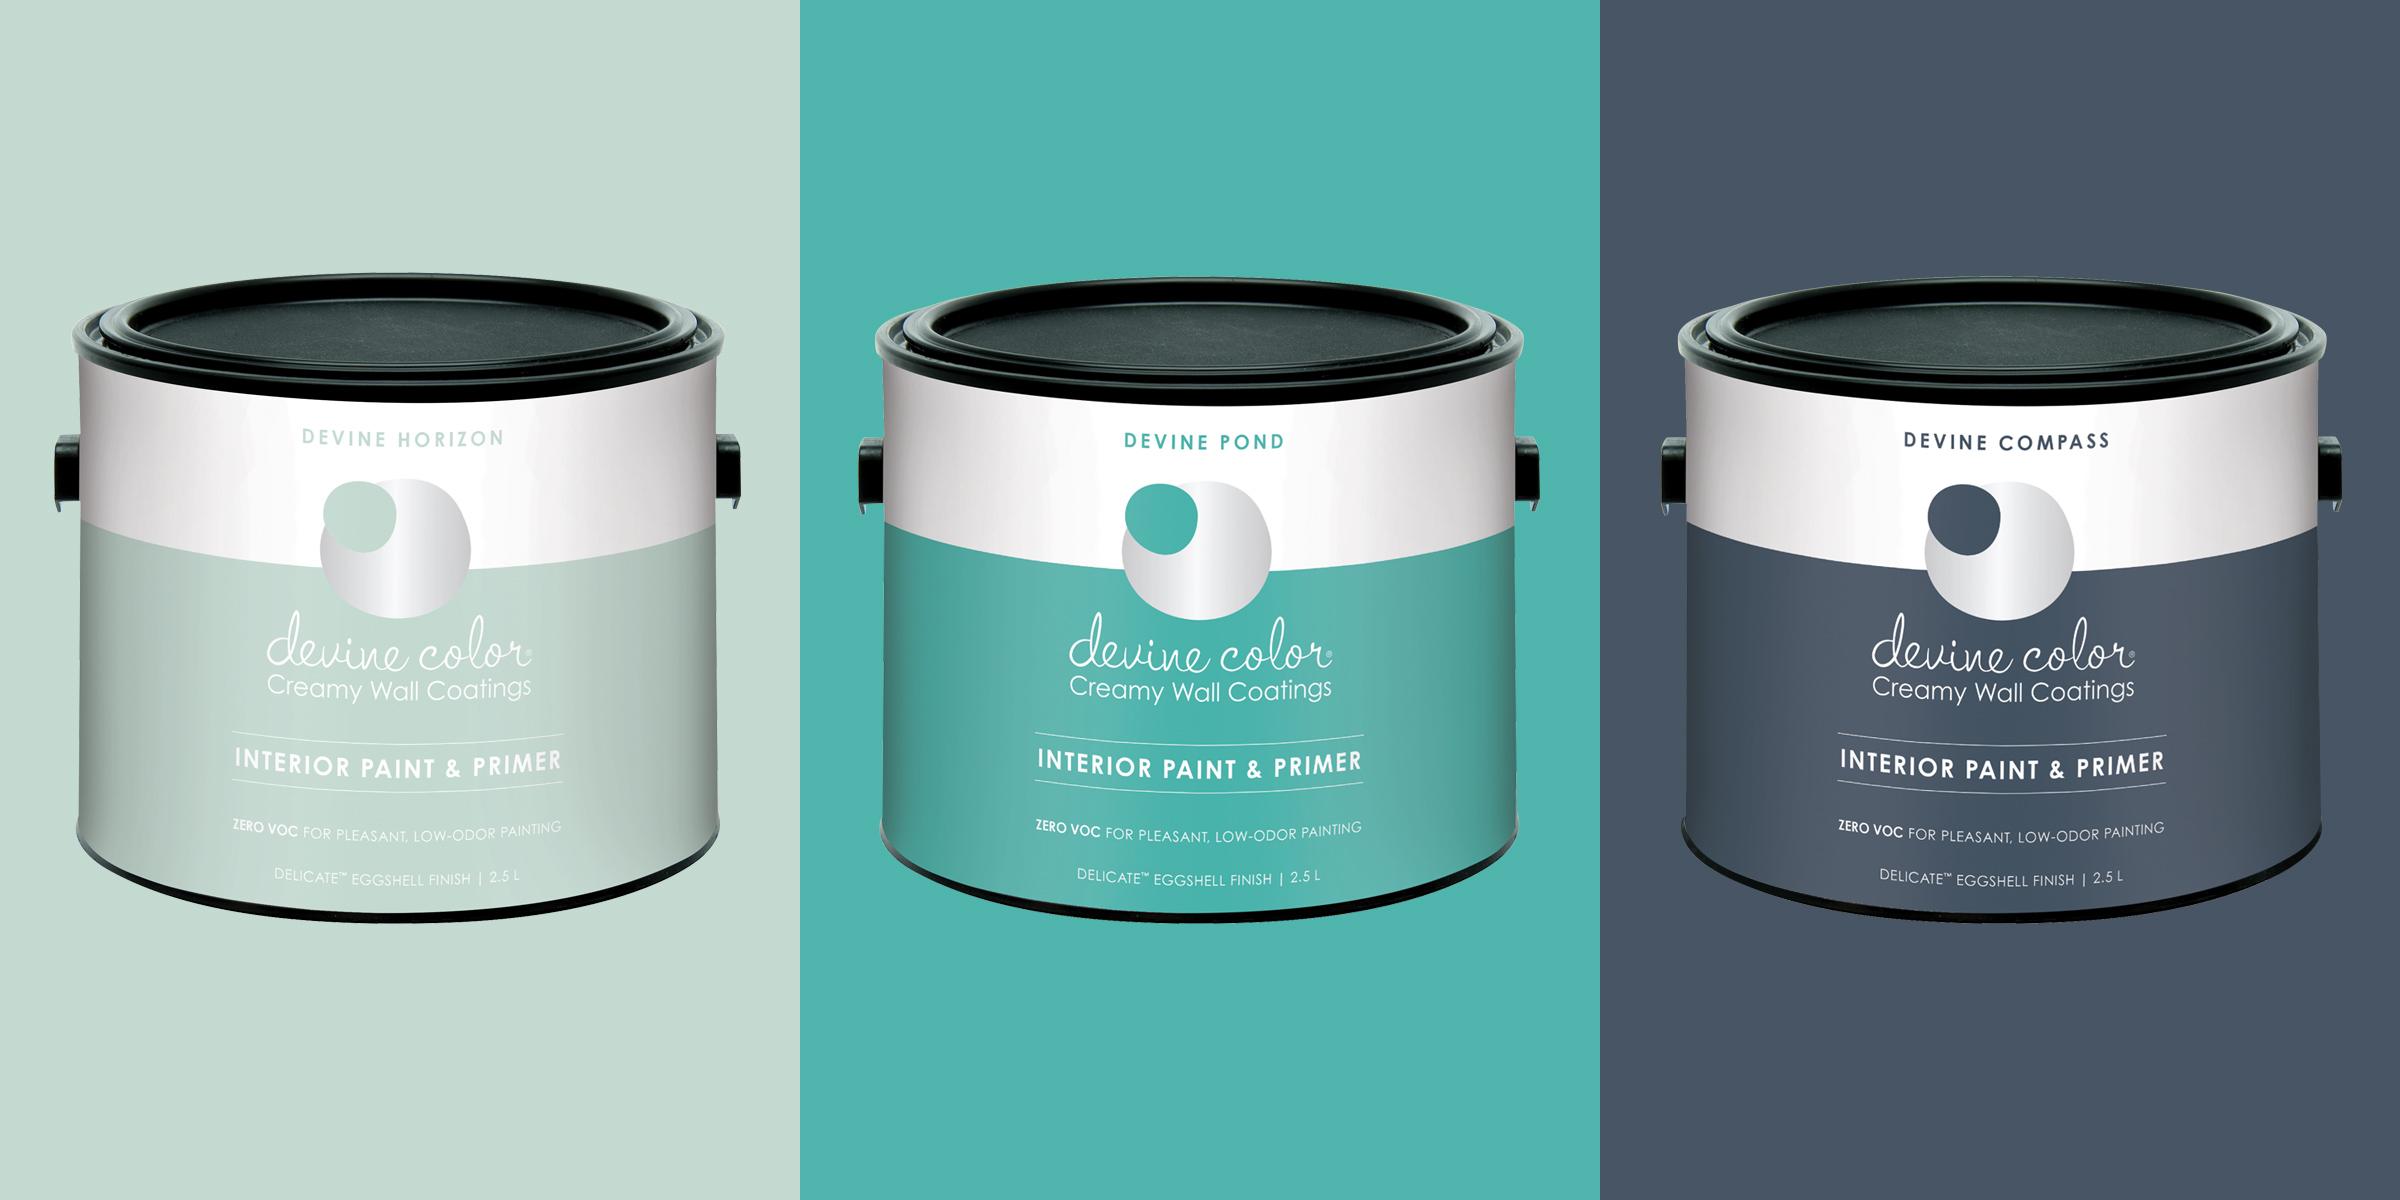 Devine Color For Target The Dieline Packaging